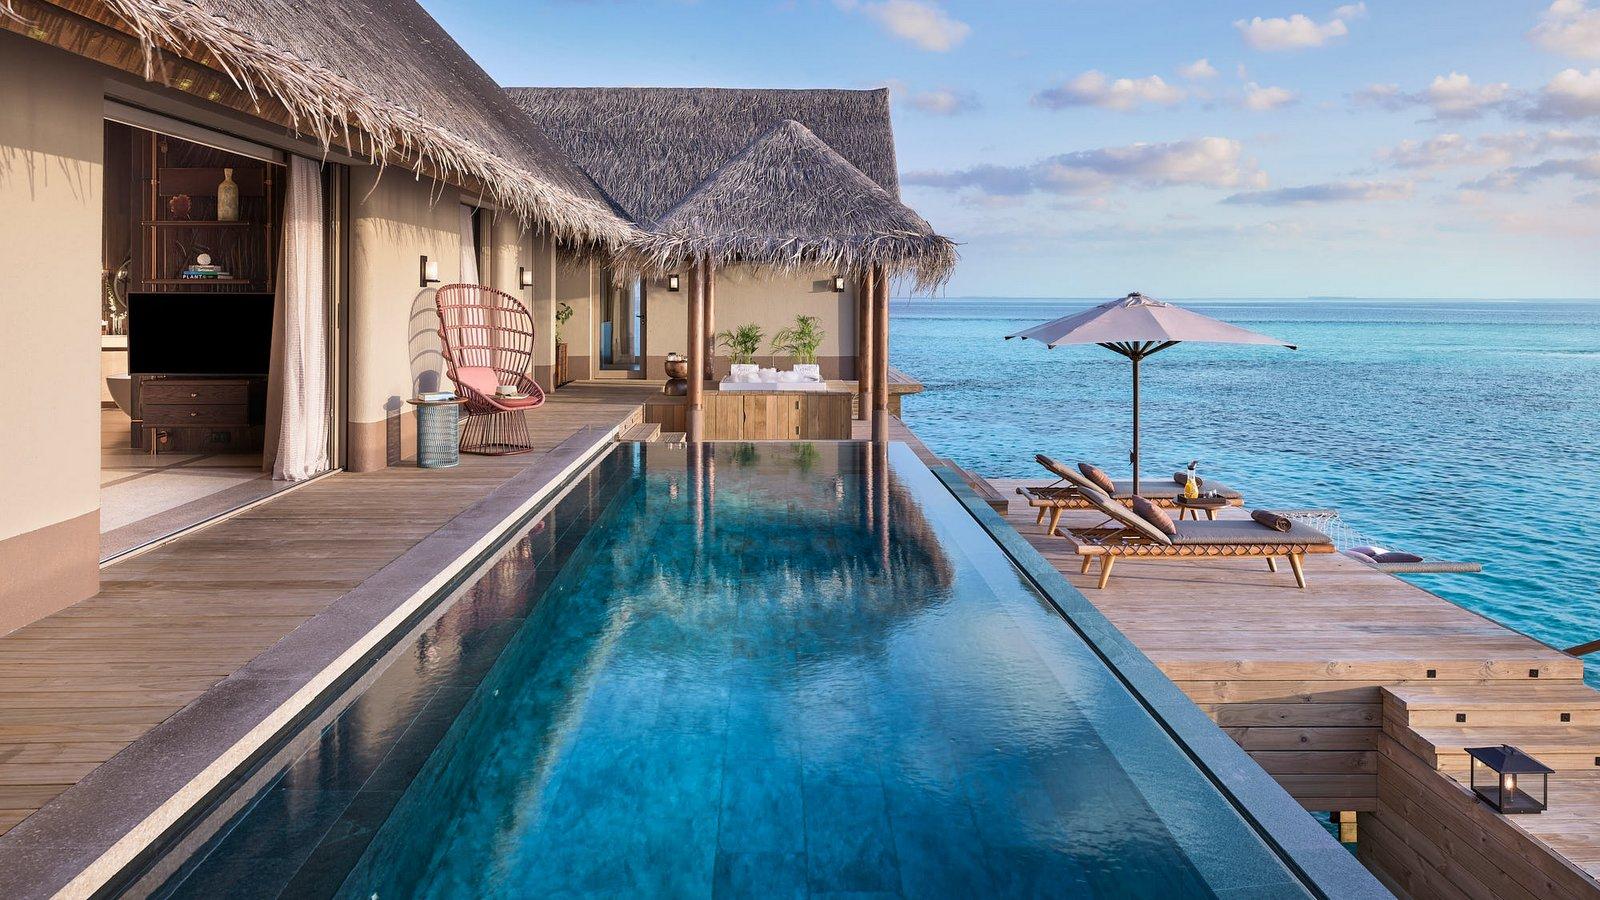 Мальдивы, отель Joali Maldives, номер Three Bed Room Ocean Residence with Two Pool